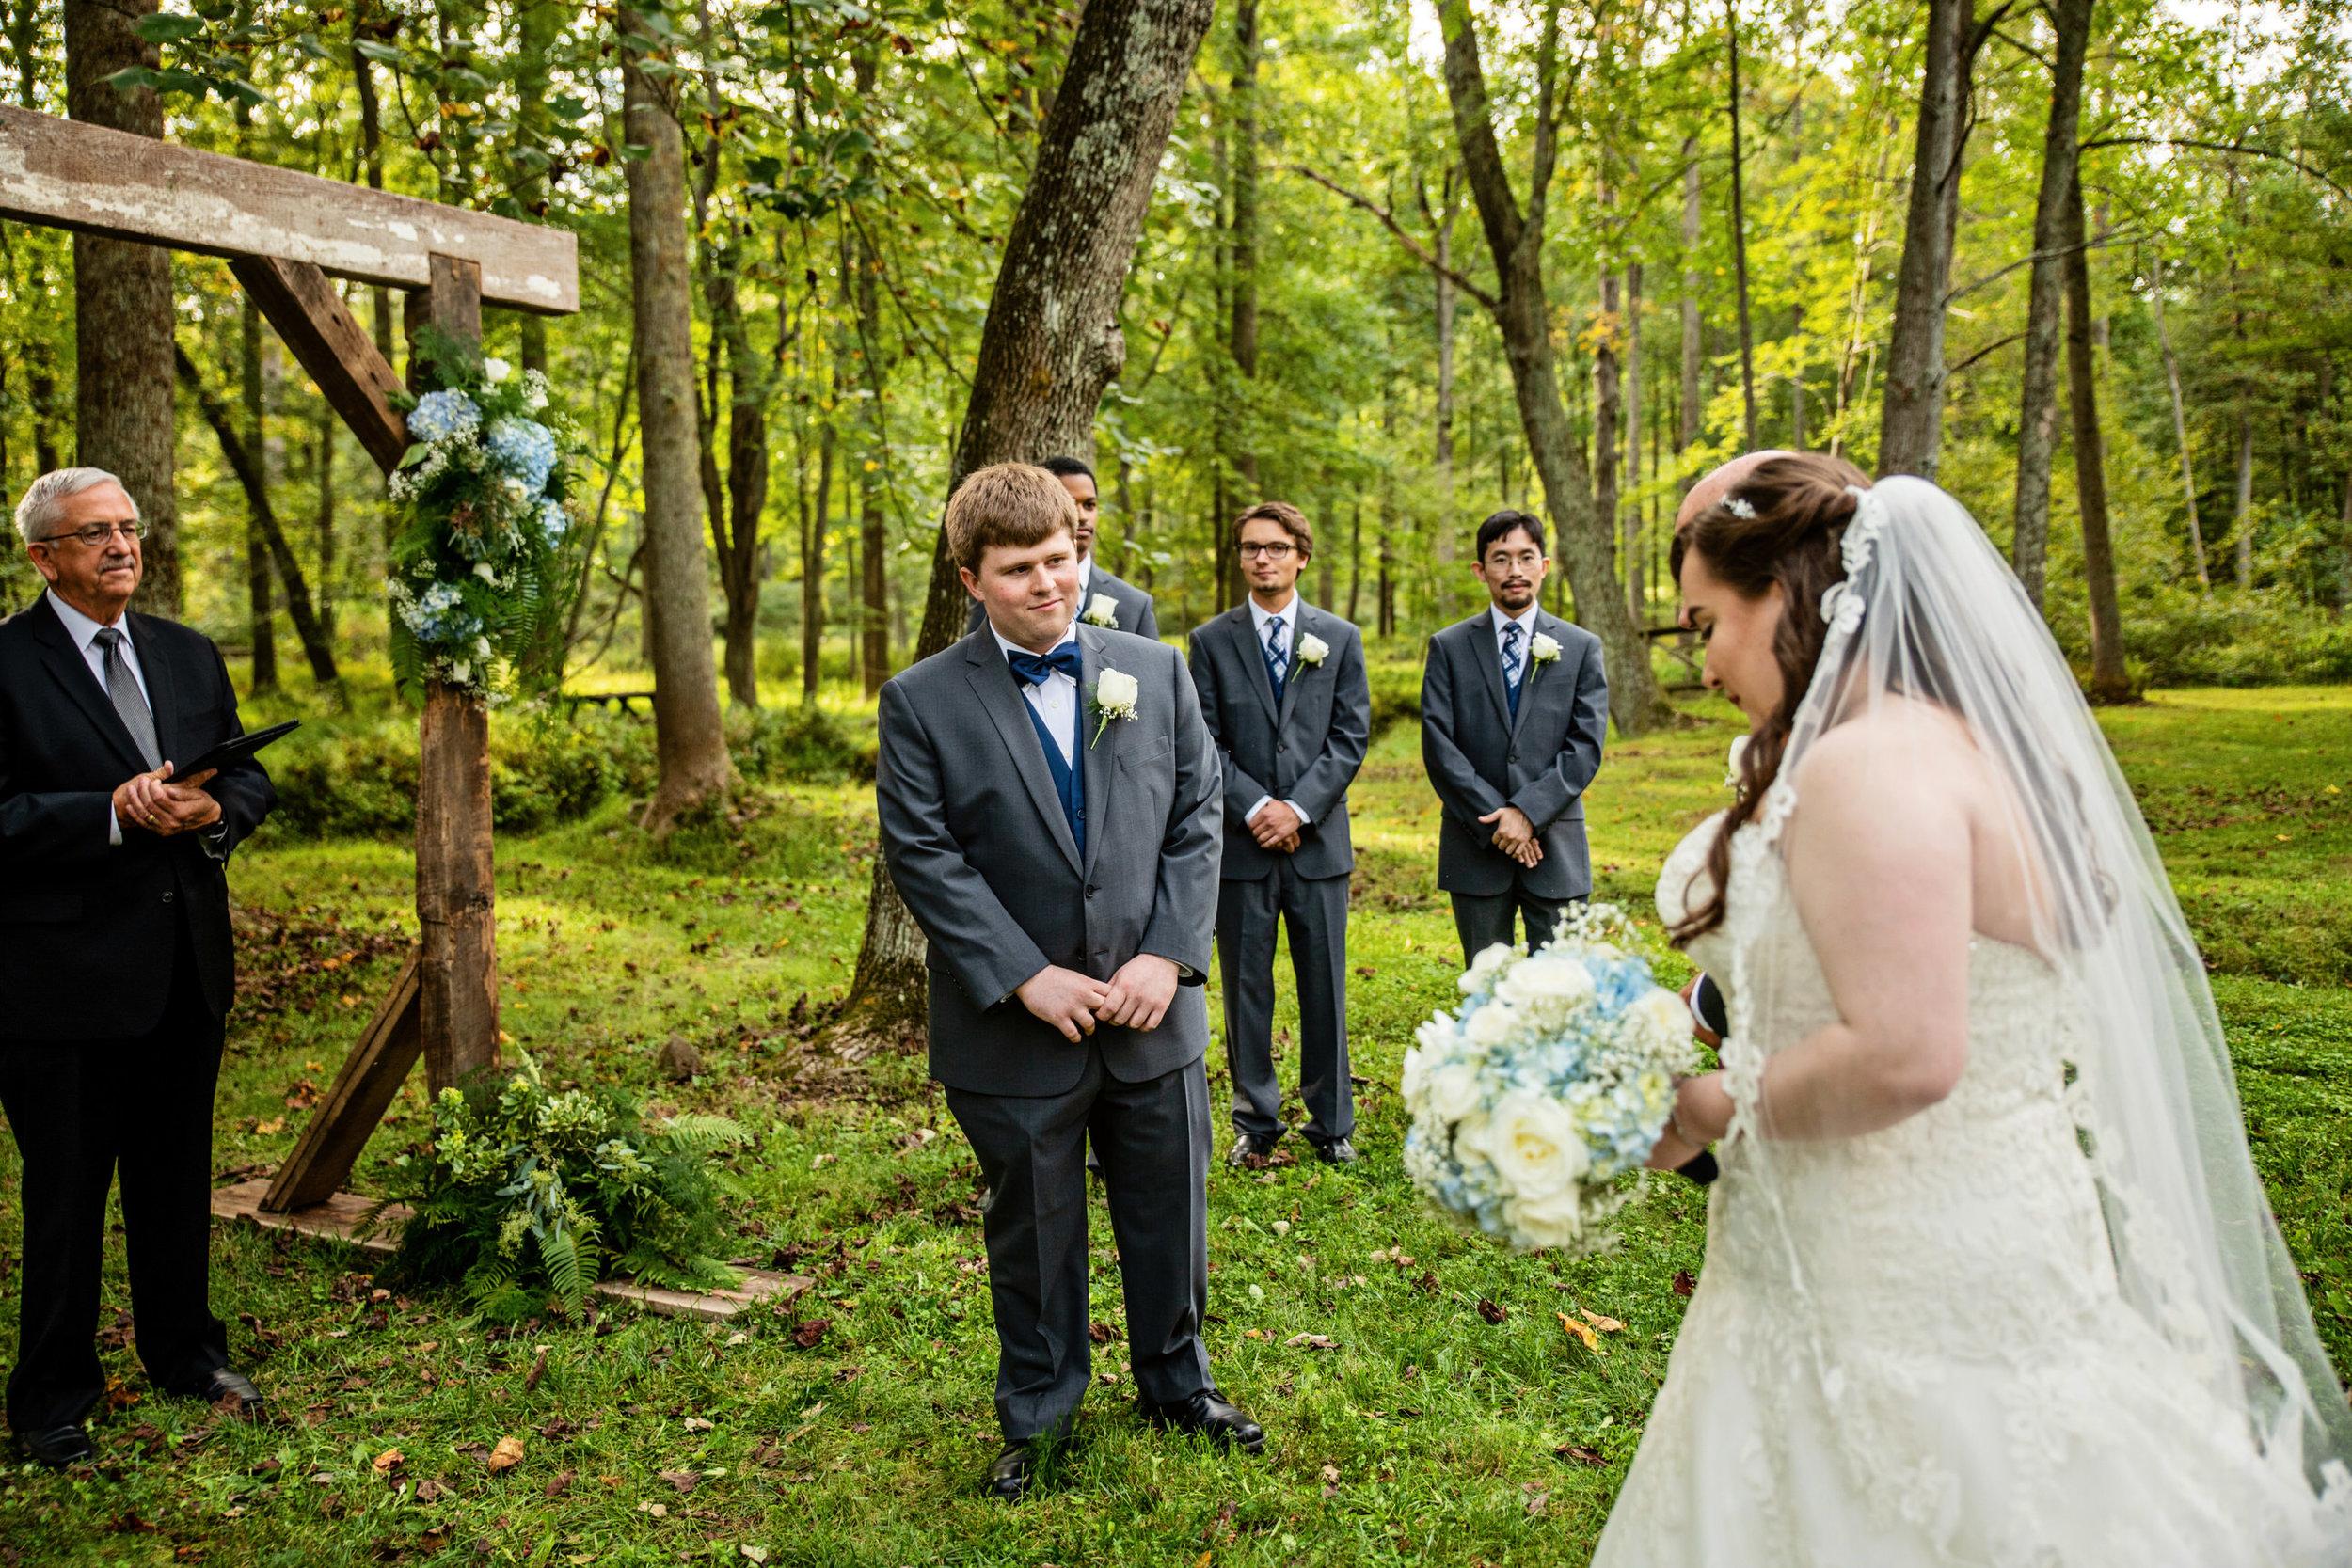 OstertaagVista-Caitlin&Brandon-Ceremony-3.jpg